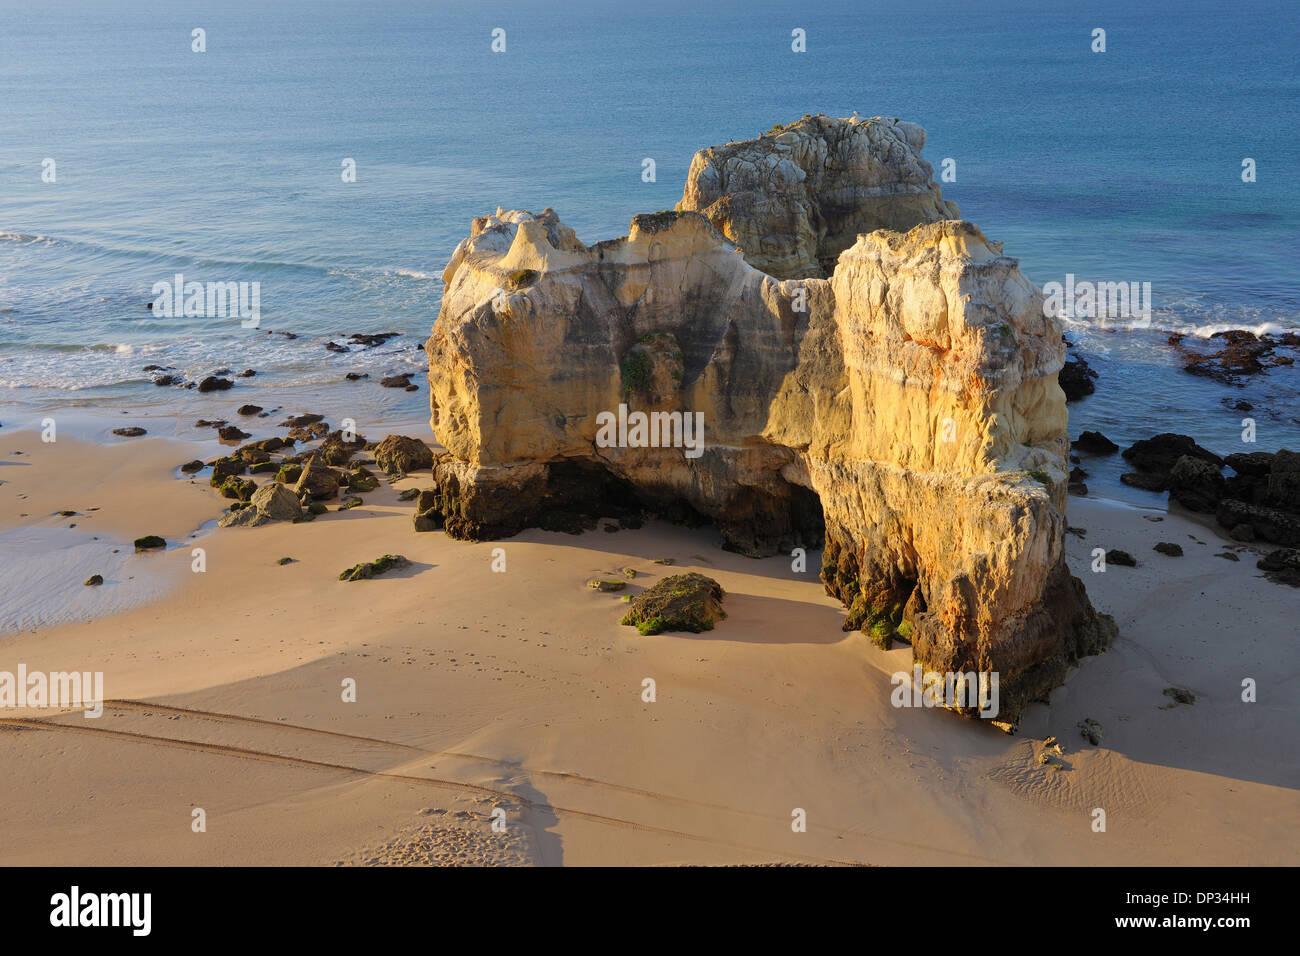 Rock Formations au Praia da Rocha, Portimao, Algarve, Portugal Banque D'Images